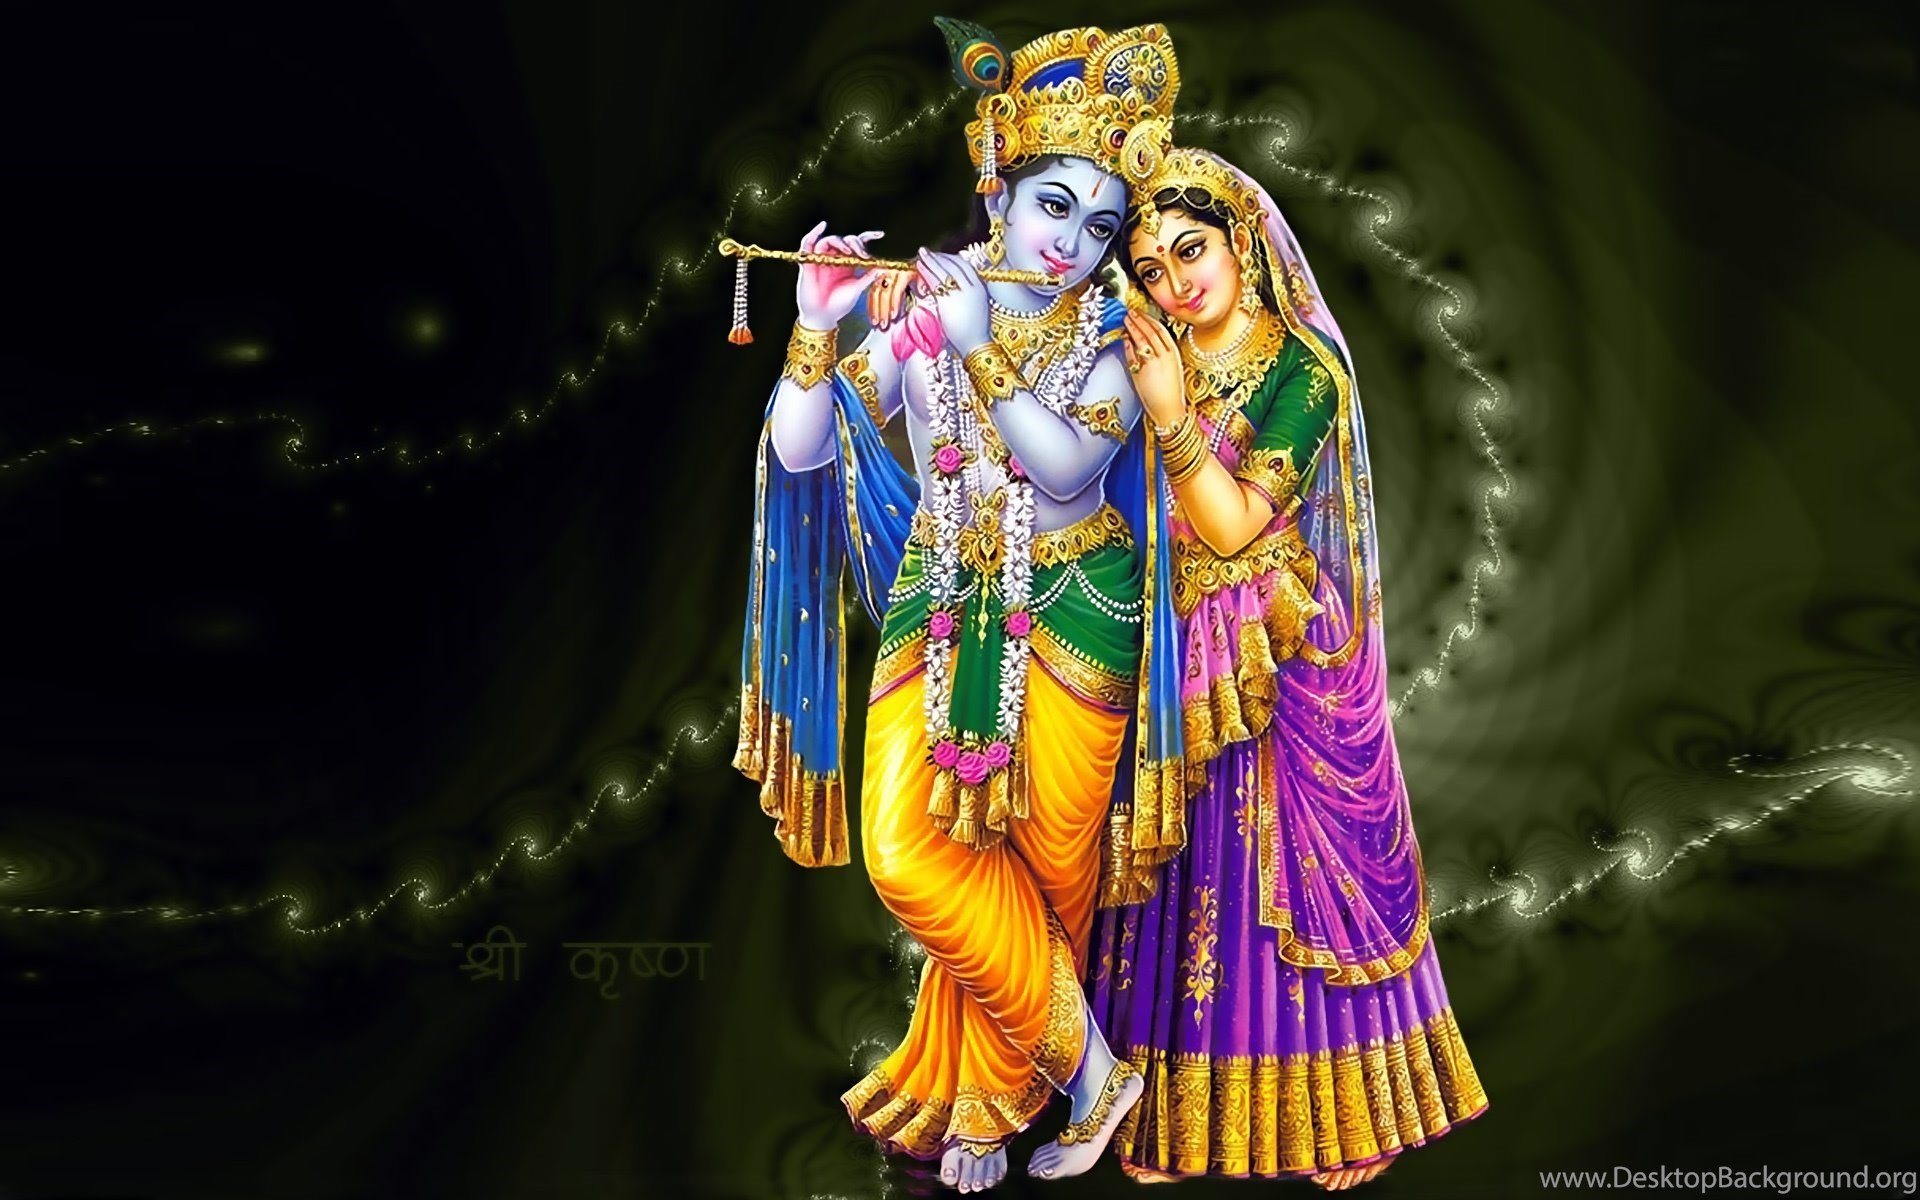 Hindu God Krishna Radha Desktop 1080p Full Hd Wallpapers Desktop Background